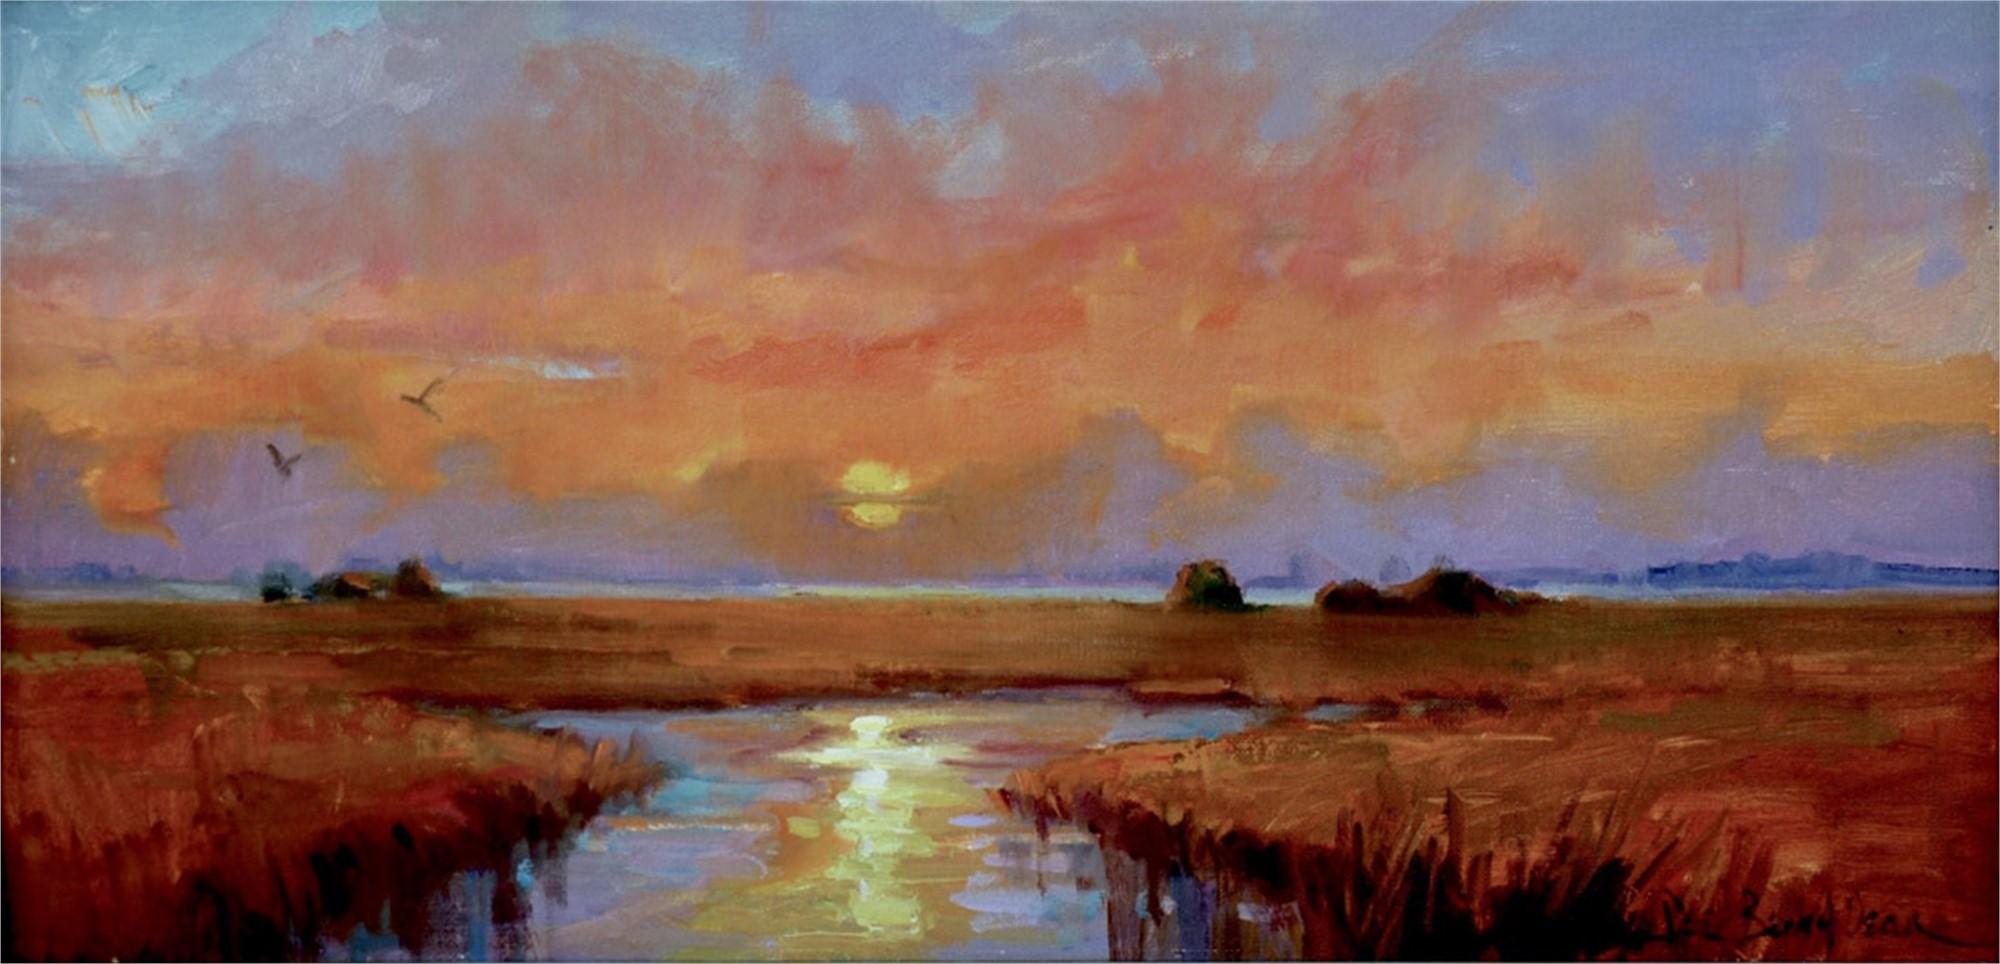 Sunset on the Island by Dee Beard Dean